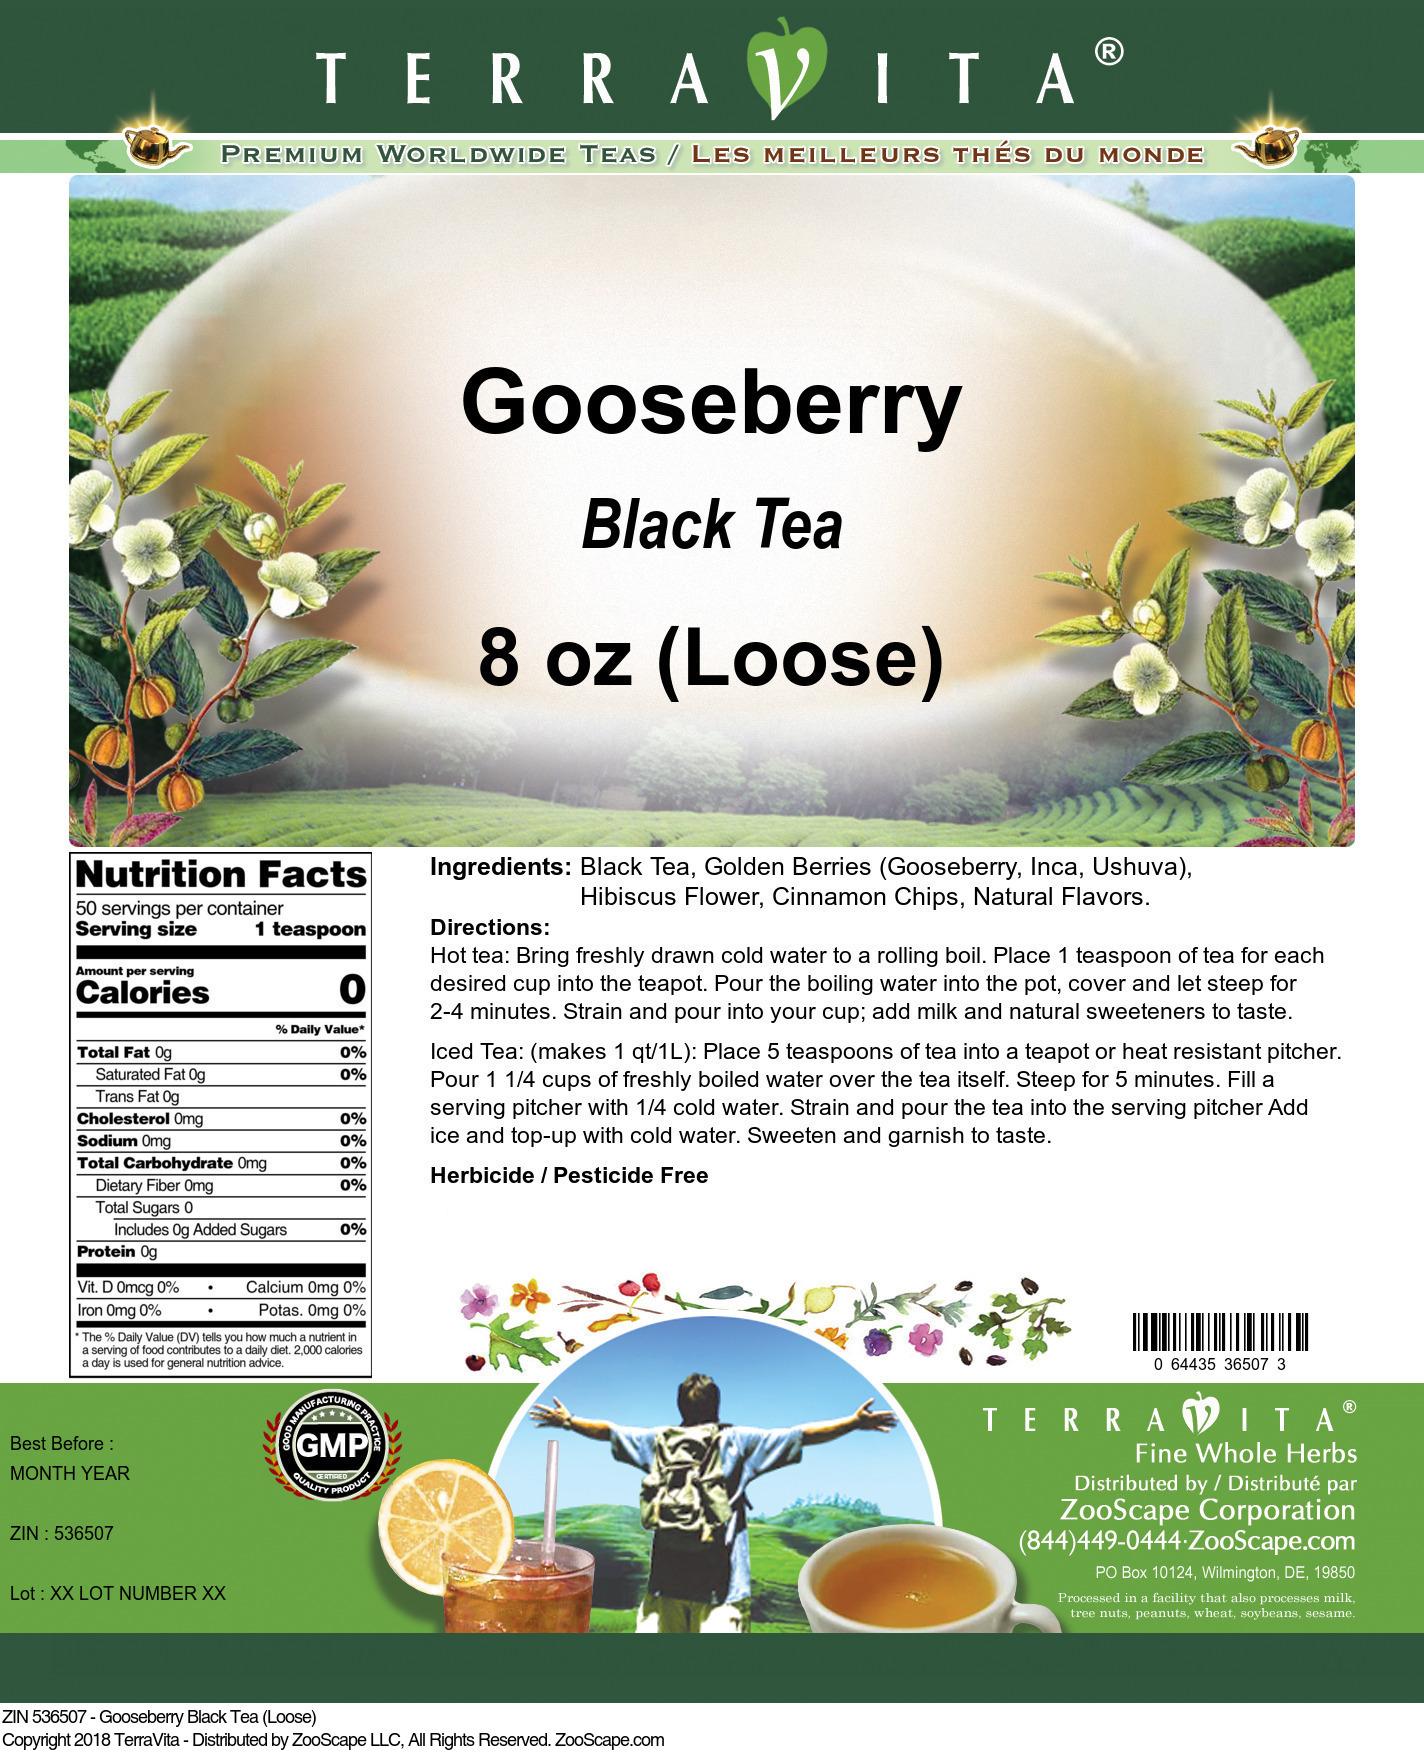 Gooseberry Black Tea (Loose)